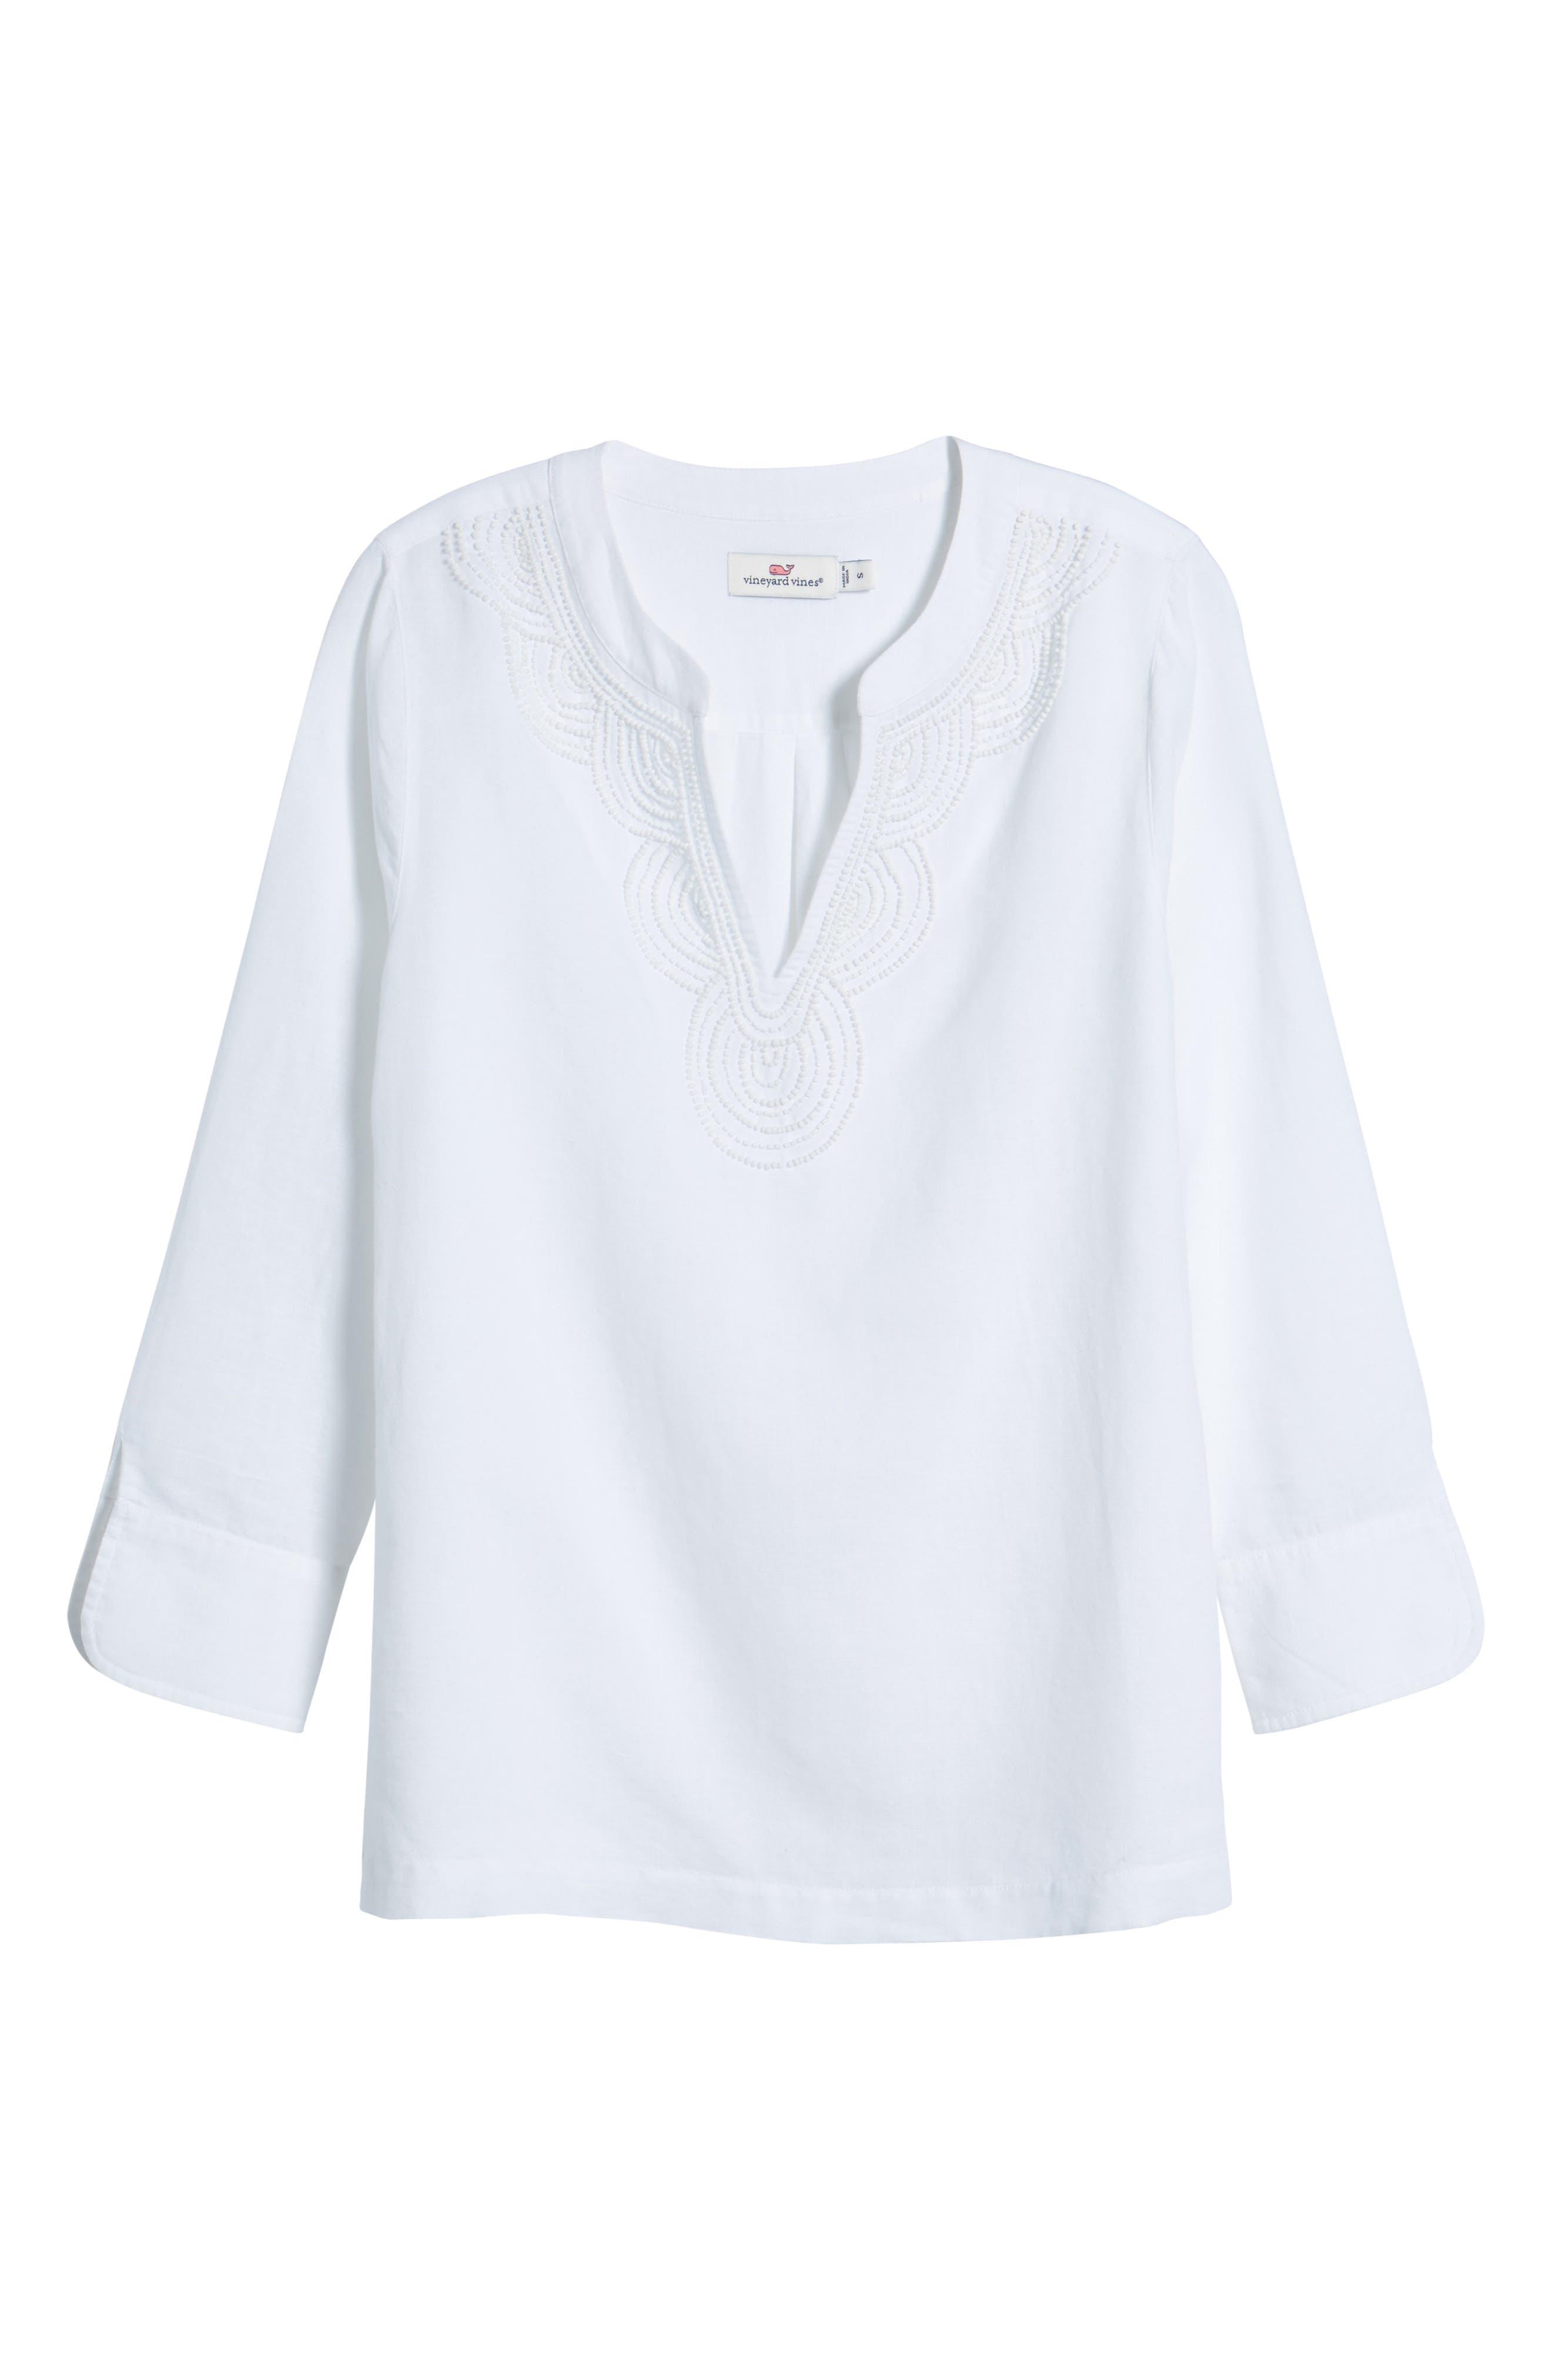 Embellished Tunic Top,                             Alternate thumbnail 7, color,                             White Cap